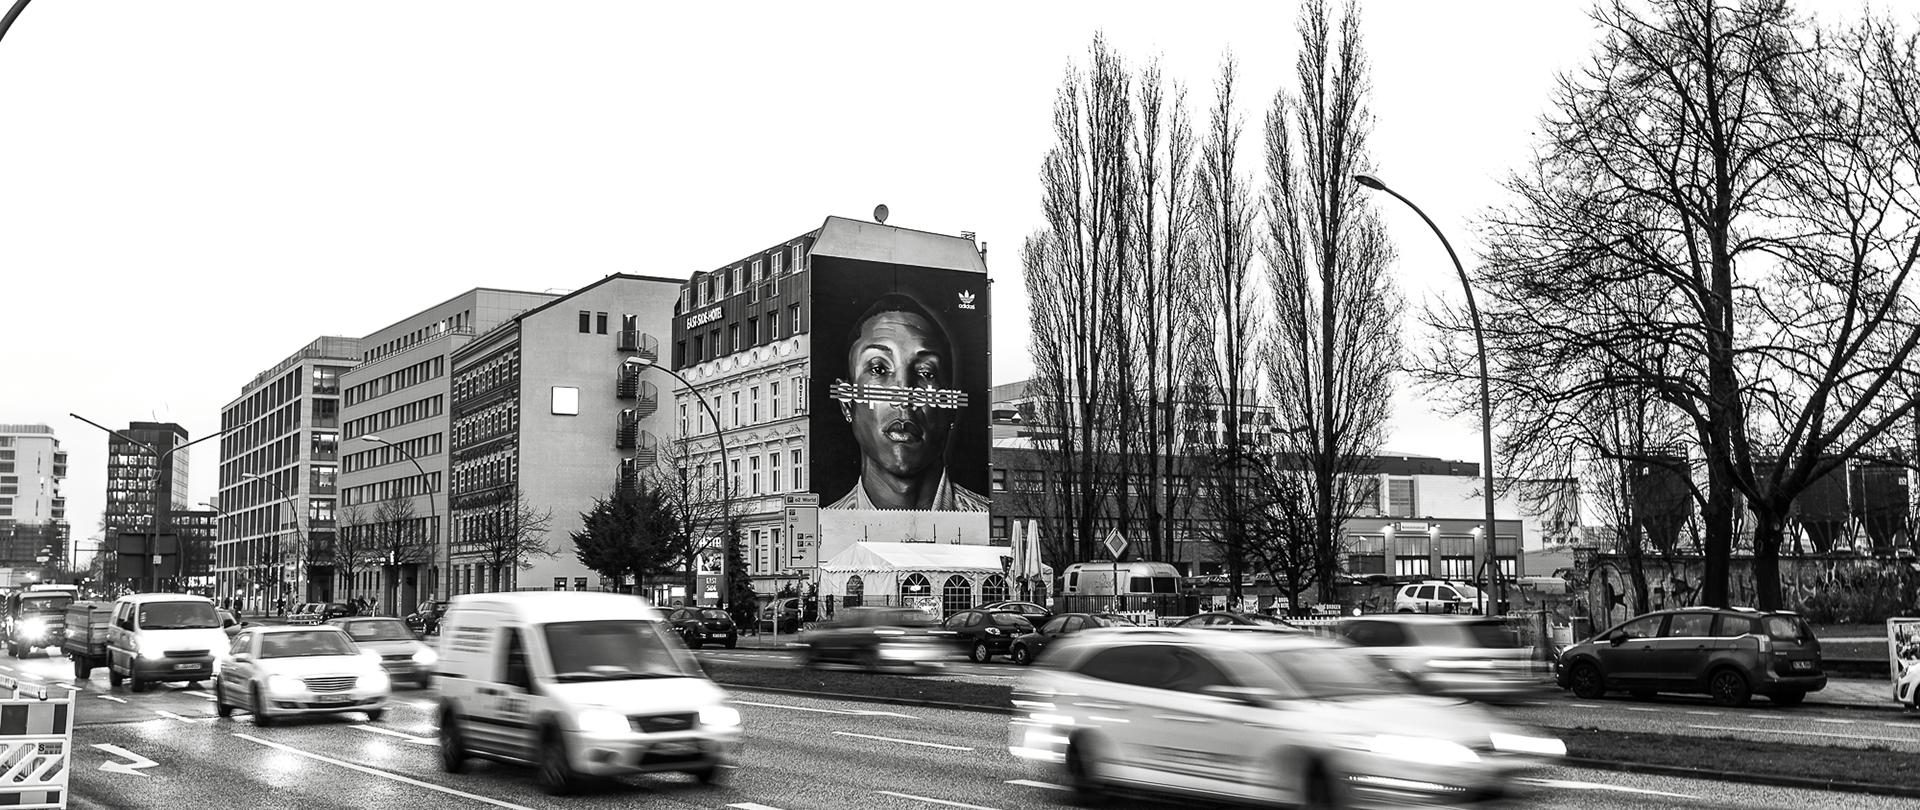 cromatics mural berlin adidas | CROMATICS